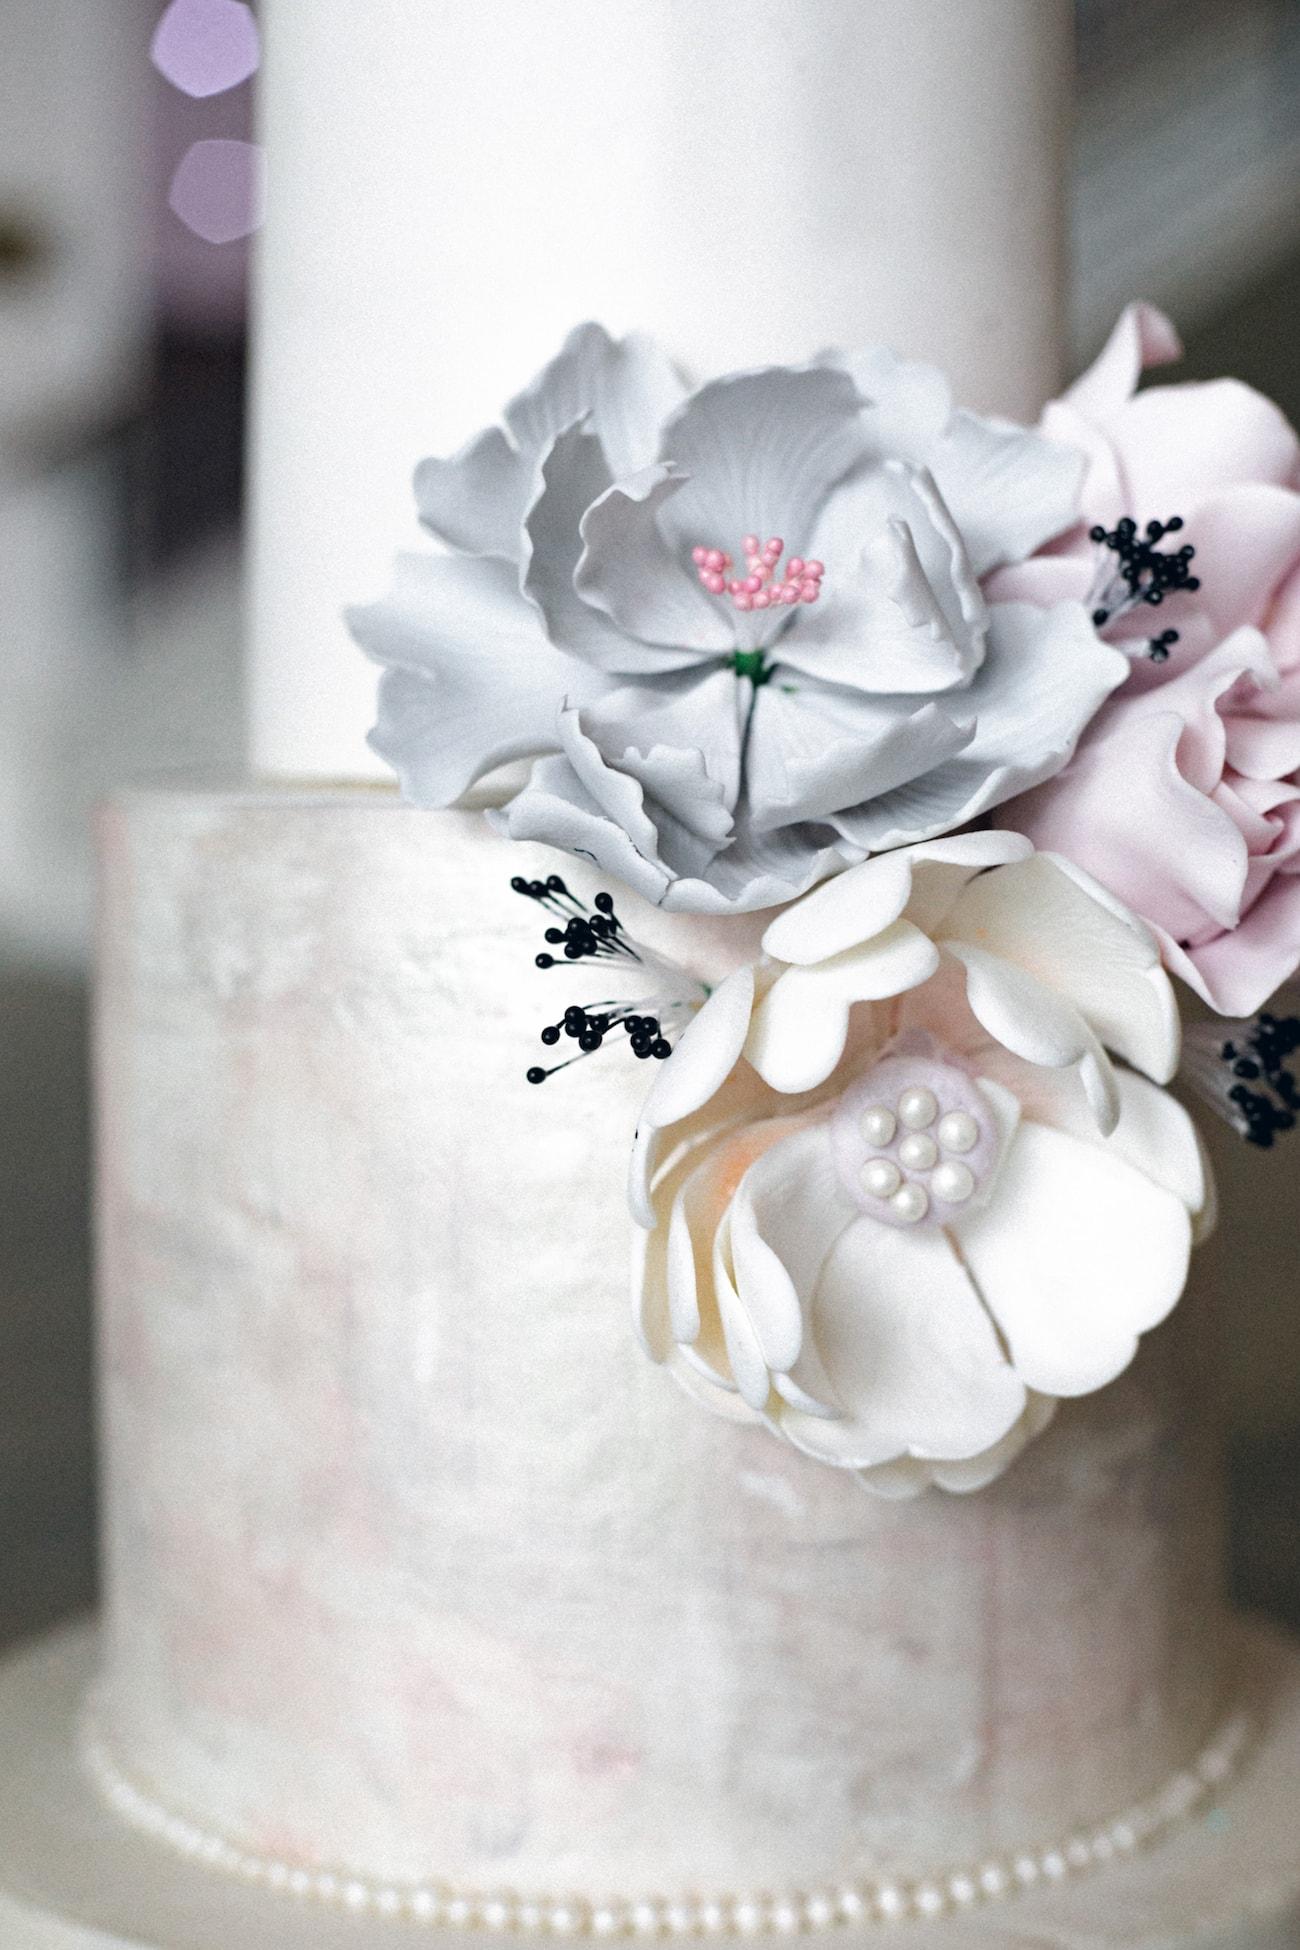 Iridescent Pastel Wedding Cake | Credit: Jessica Notelo (11)